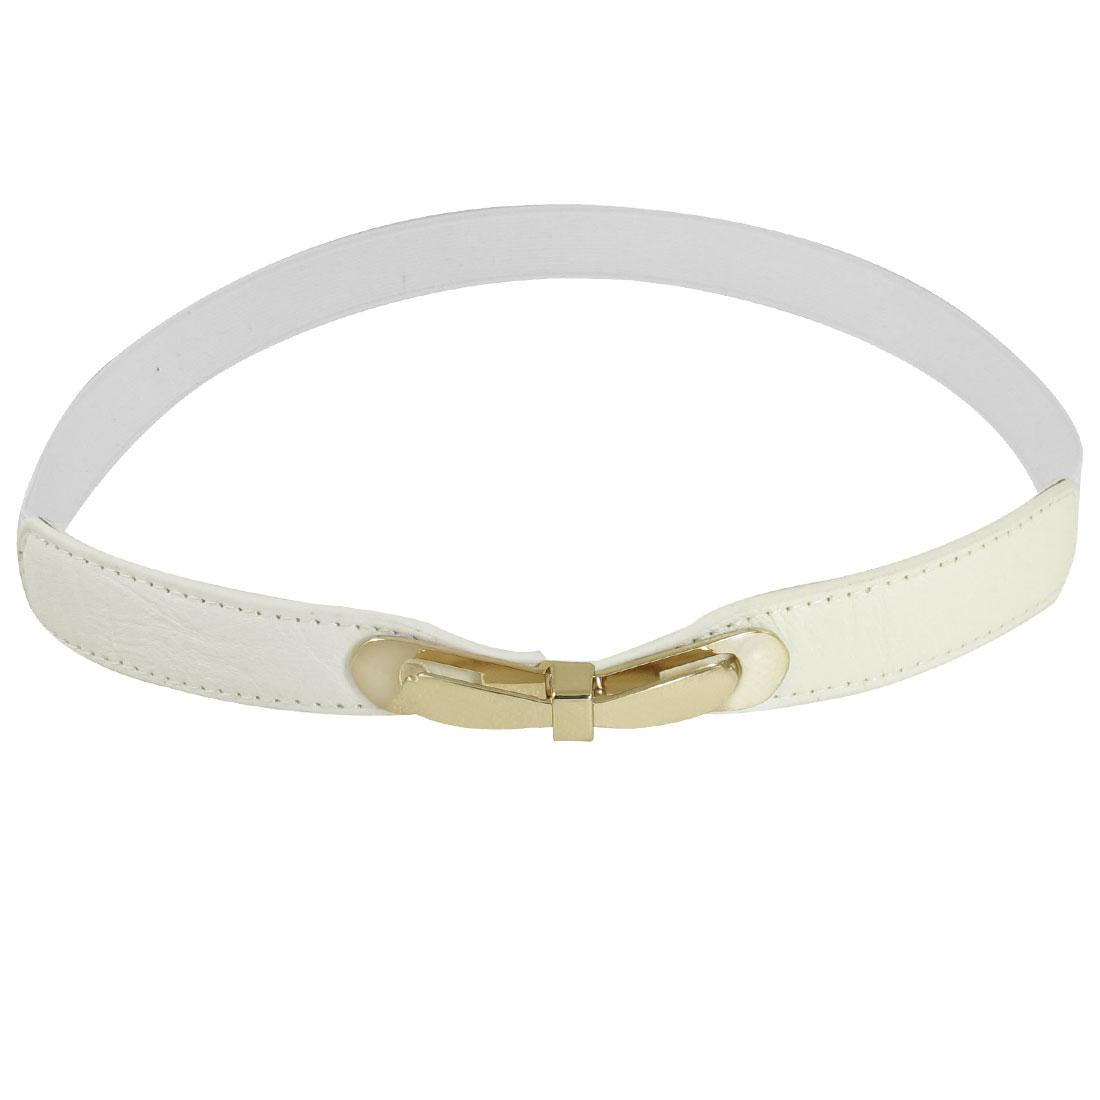 Metal Bowknot Interlocking Buckle Textured Stretch Belt White for Women Ladies